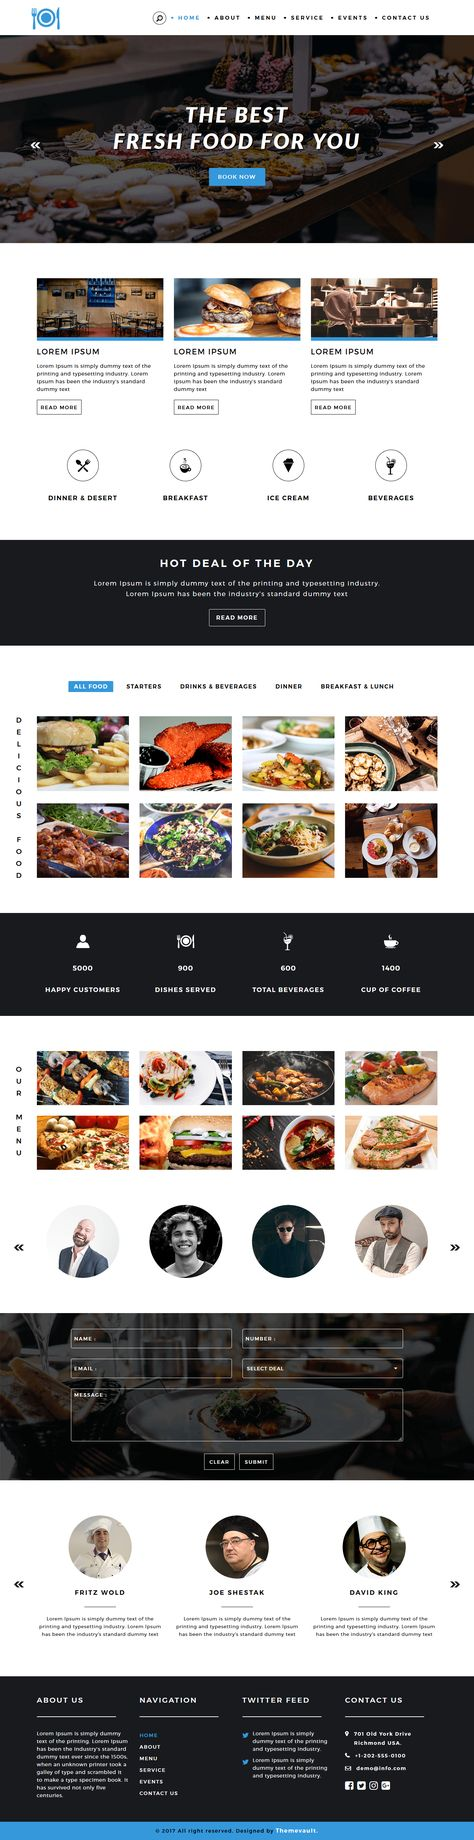 Free html5 responsive web template for Hotel & Resort website ...